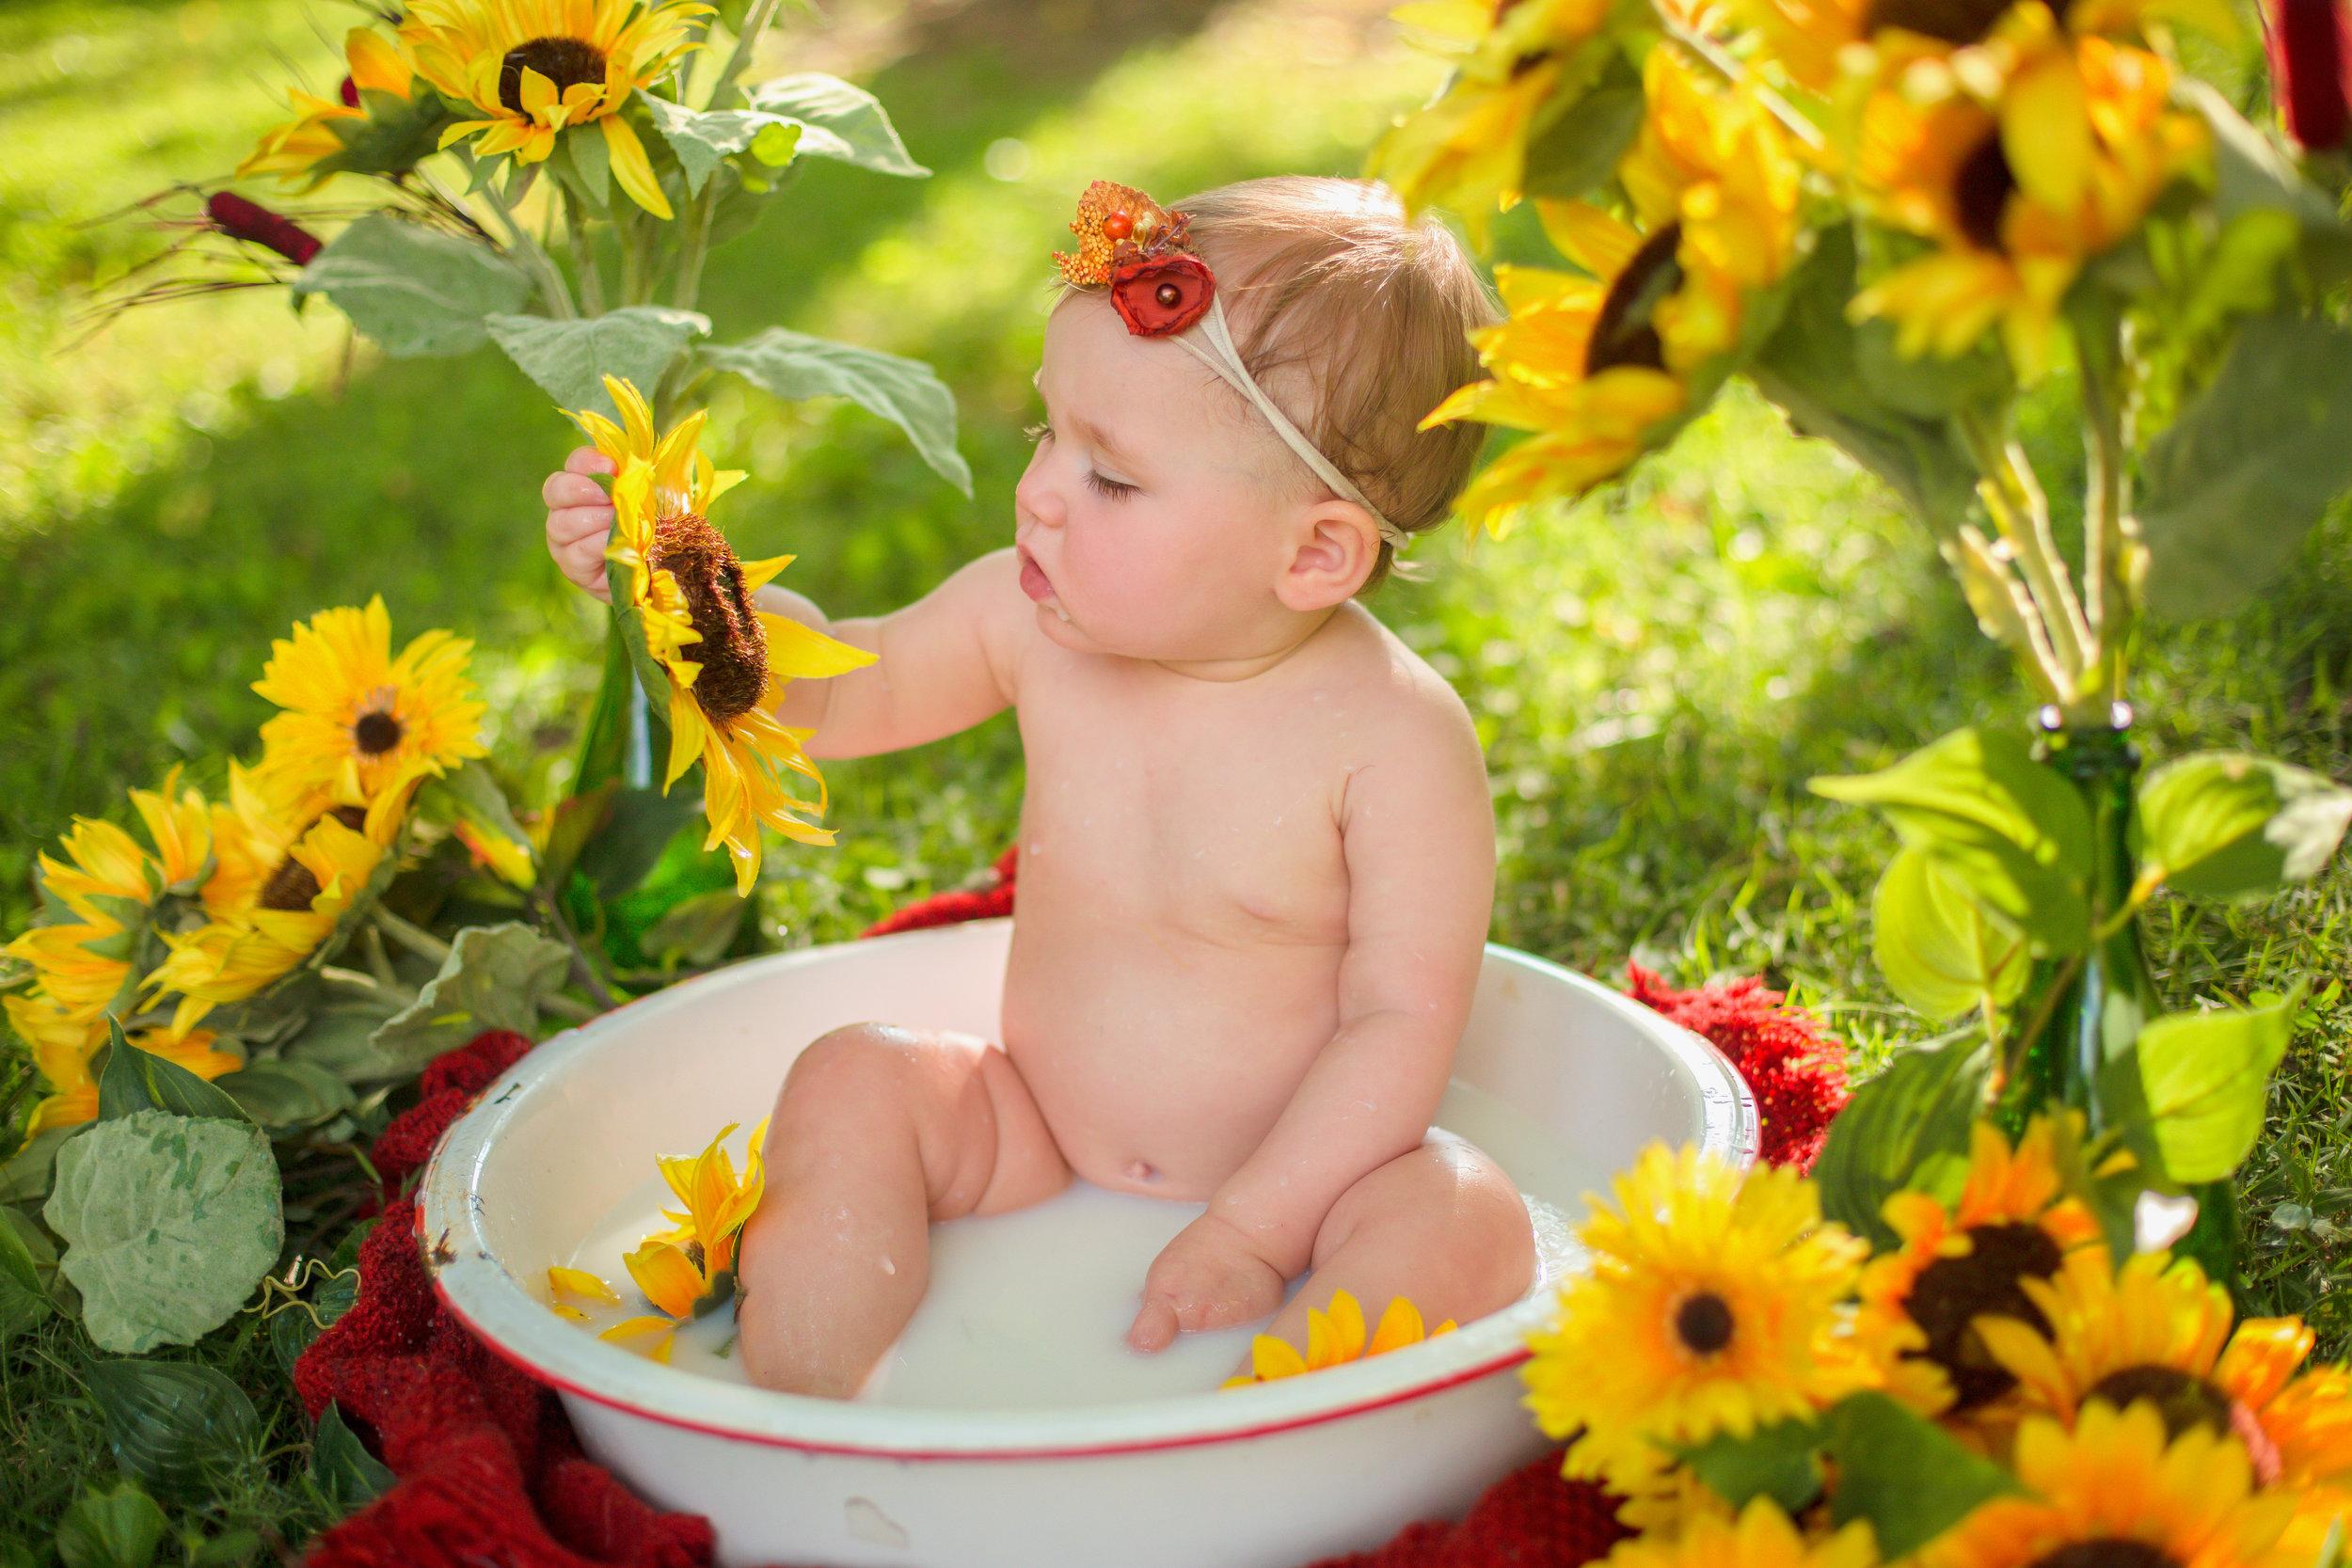 Sawyer-Jo-Sunflower-Milk-bath-Nashville-Family-Photographer-Chelsea-Meadows-Photography-(29).jpg